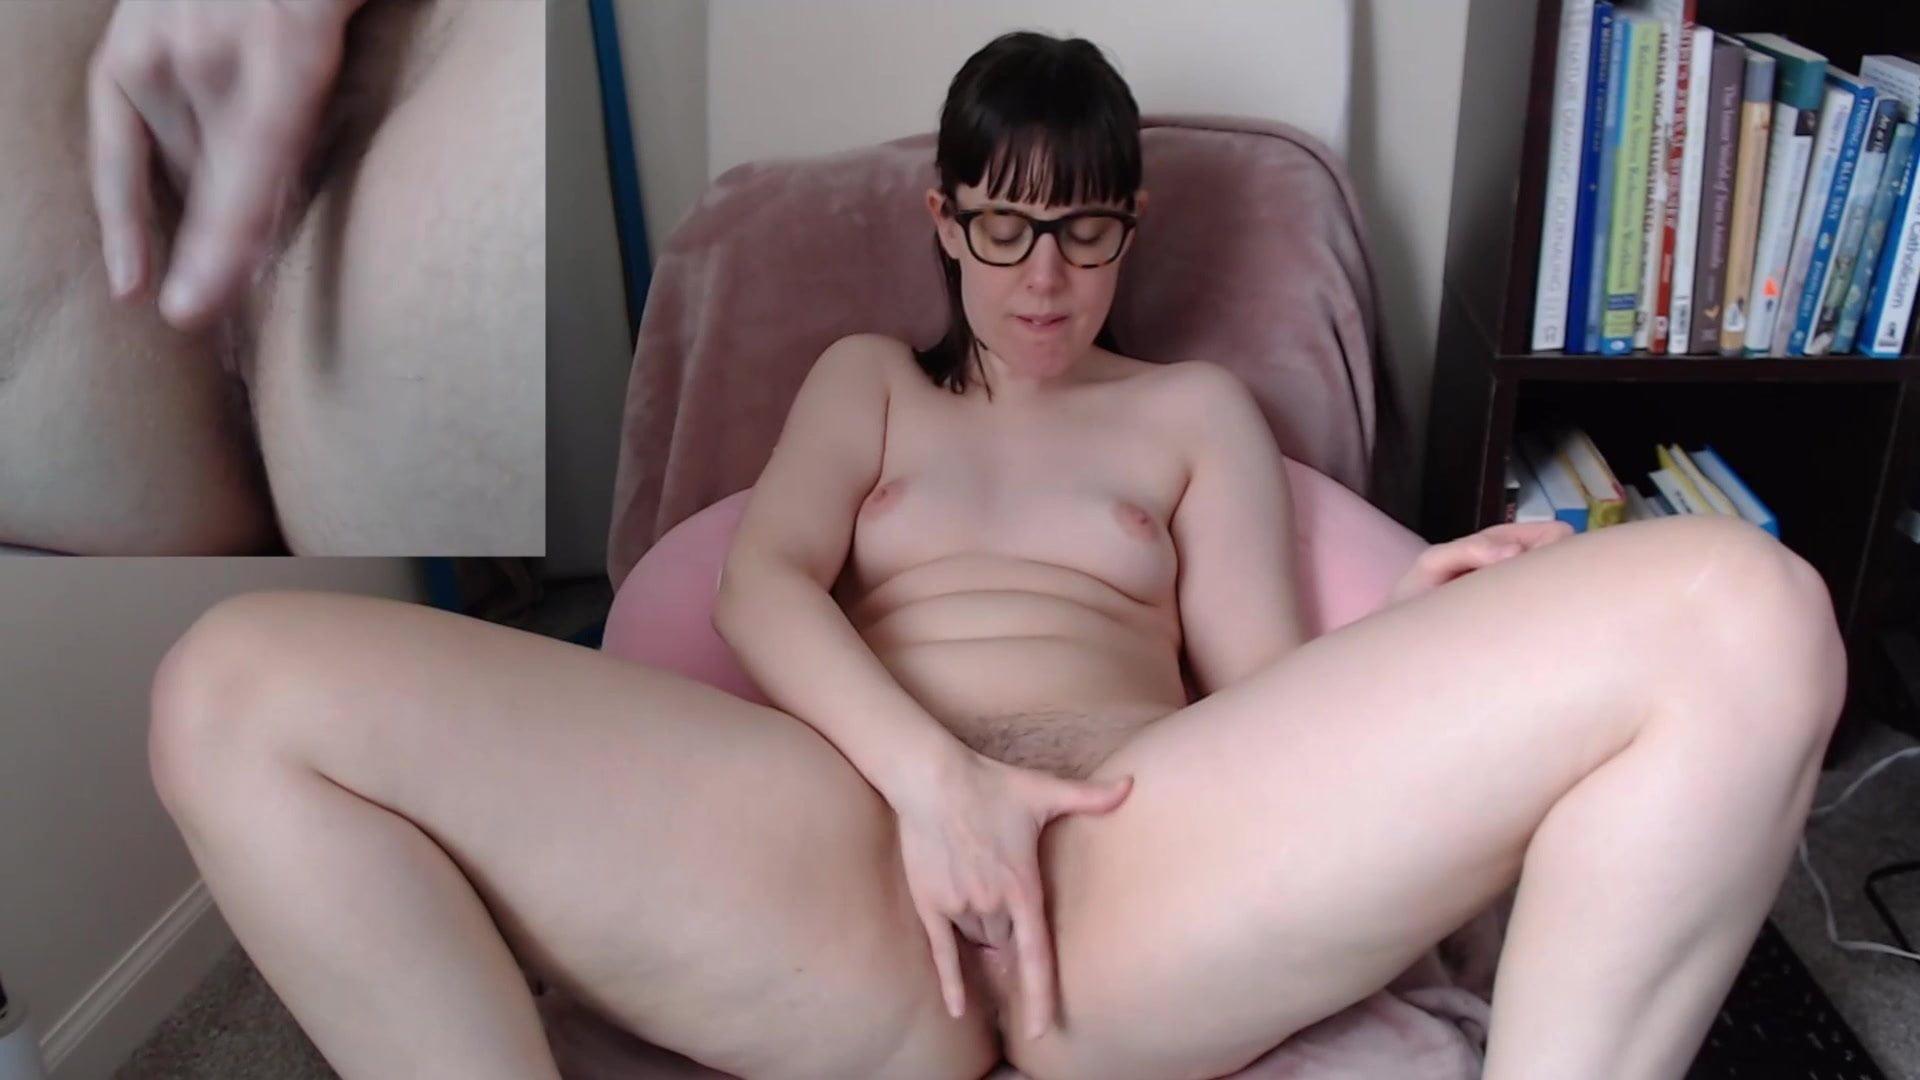 Nerd Porn